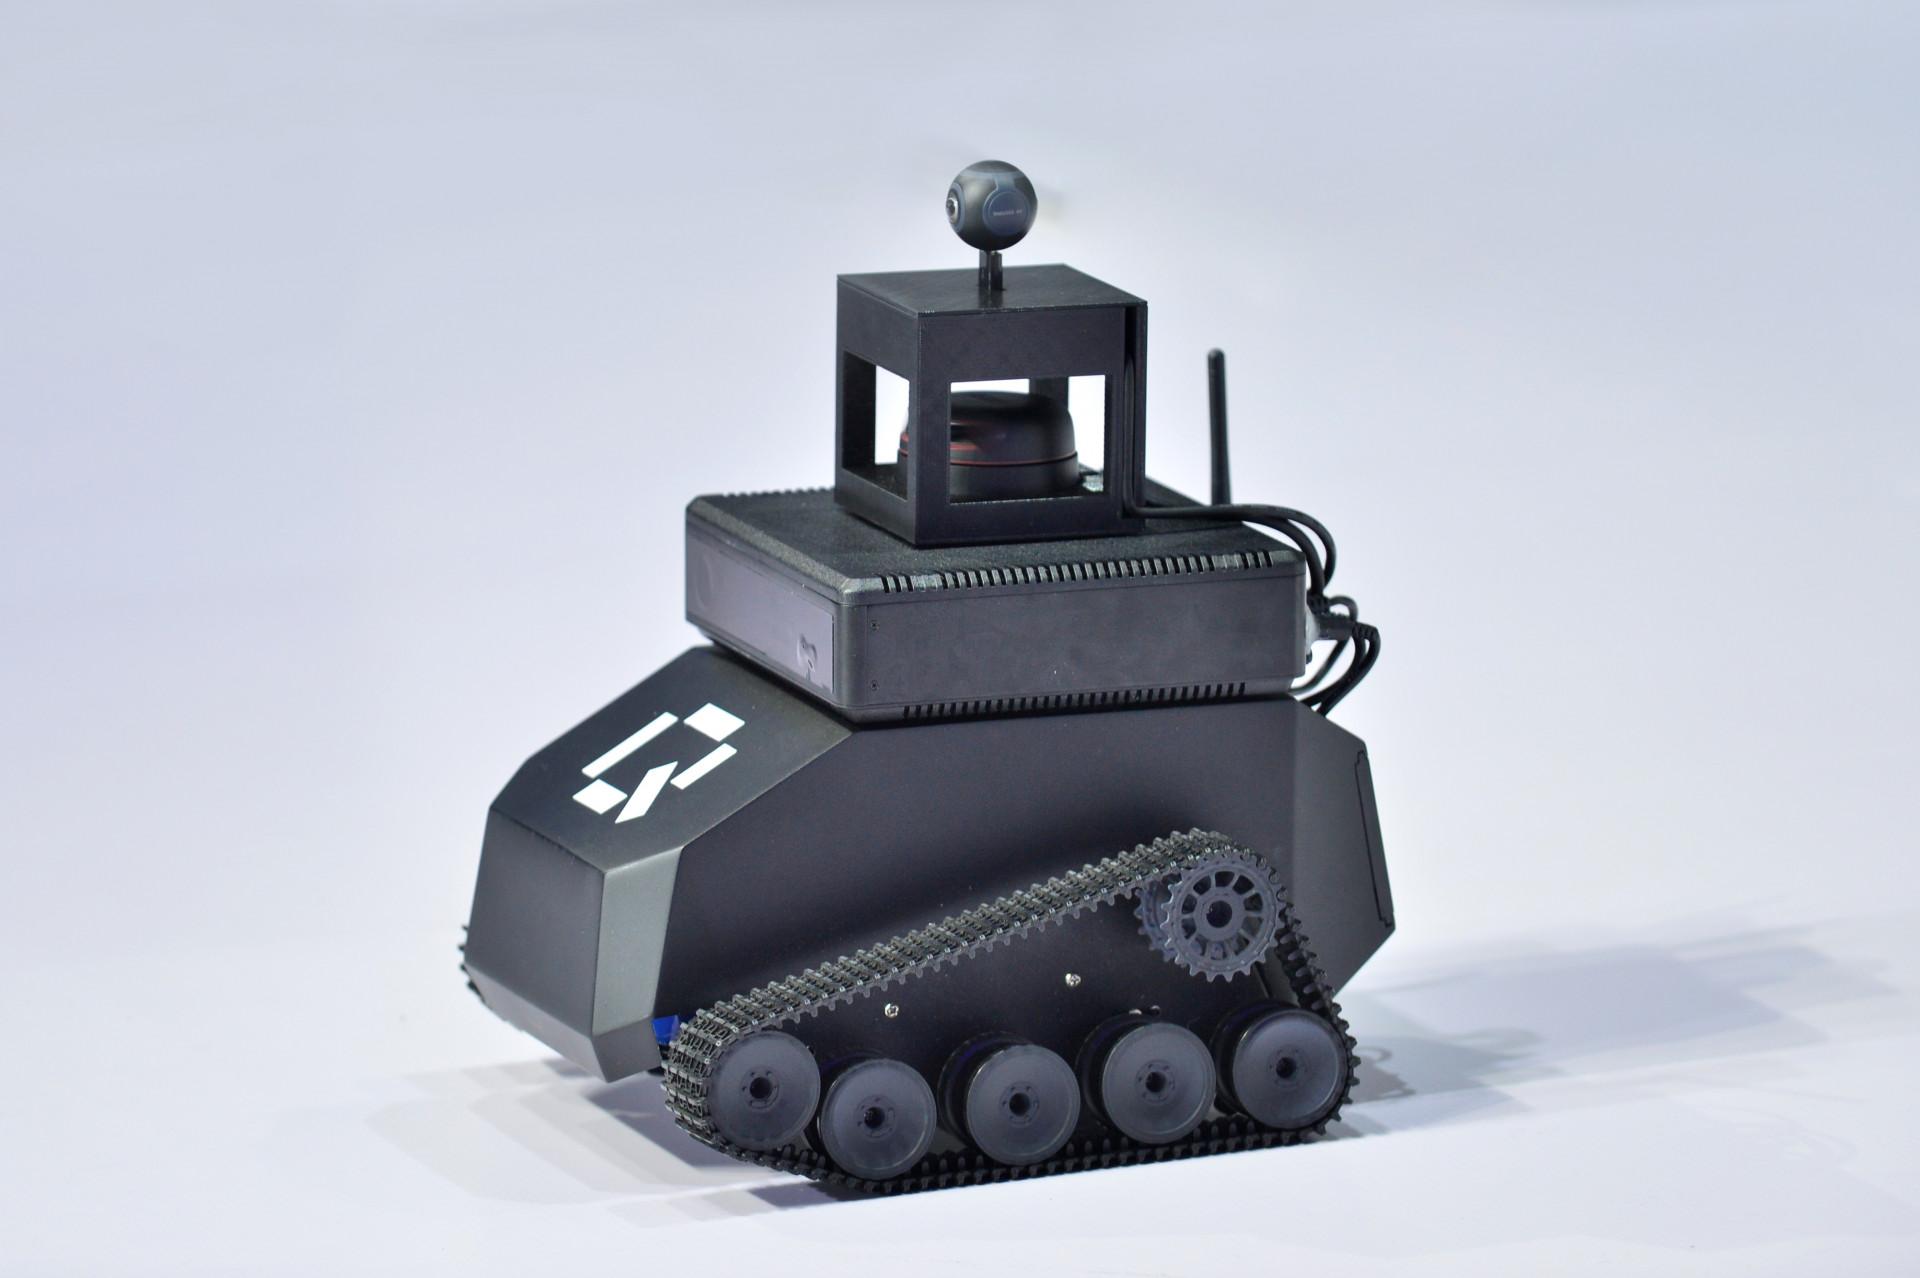 Raven Q sensory robot